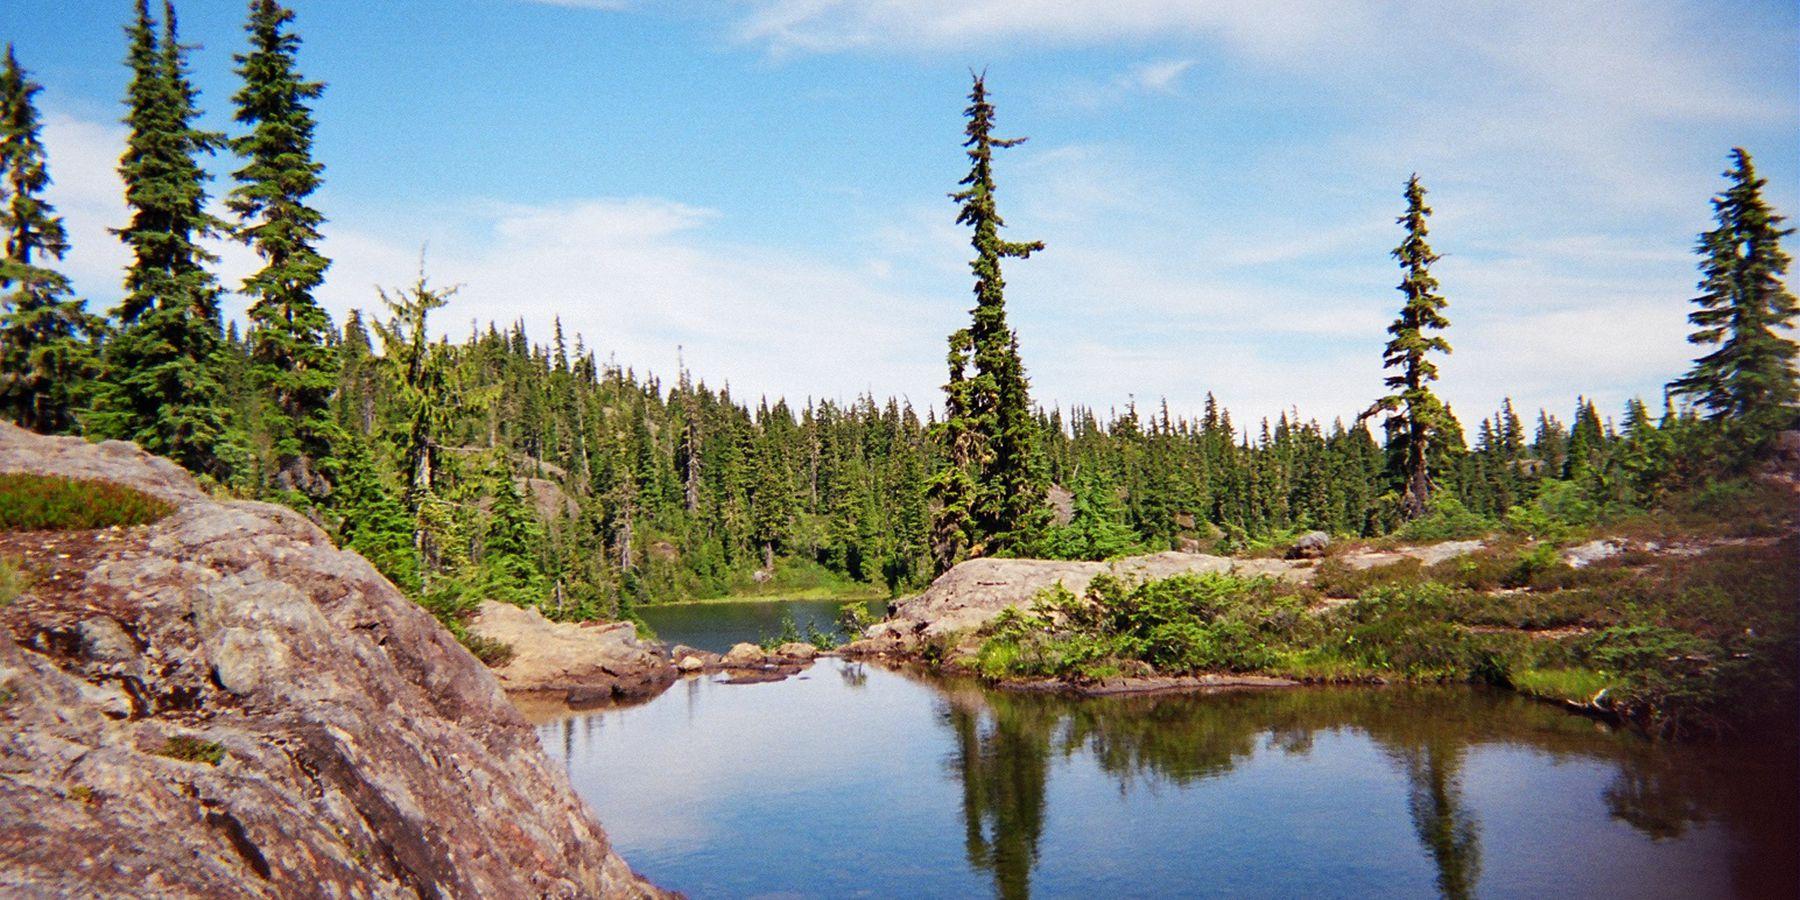 Strathcona Provincial Park Forbidden Plateau